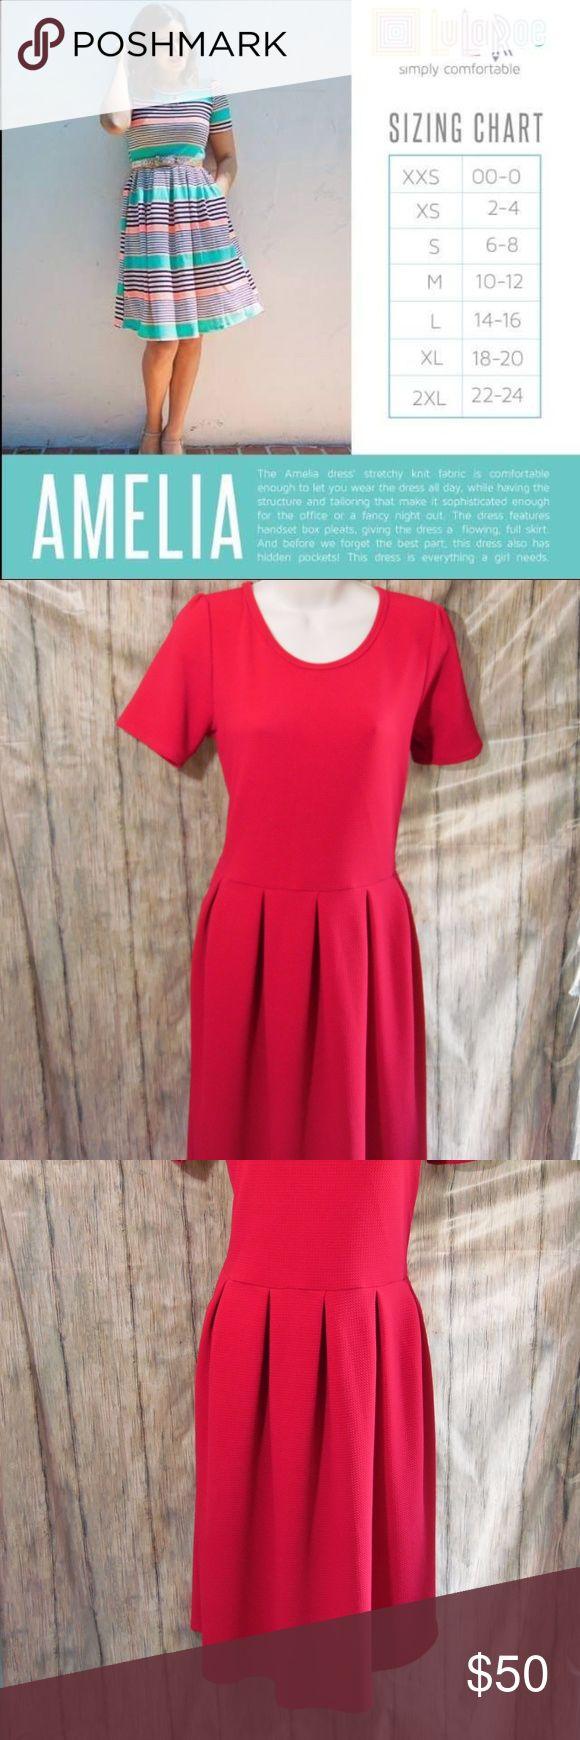 Lularoe Amelia Dress Textured in Magenta/Pink EUC No flaws Zipper works flawlessly LuLaRoe Dresses Midi